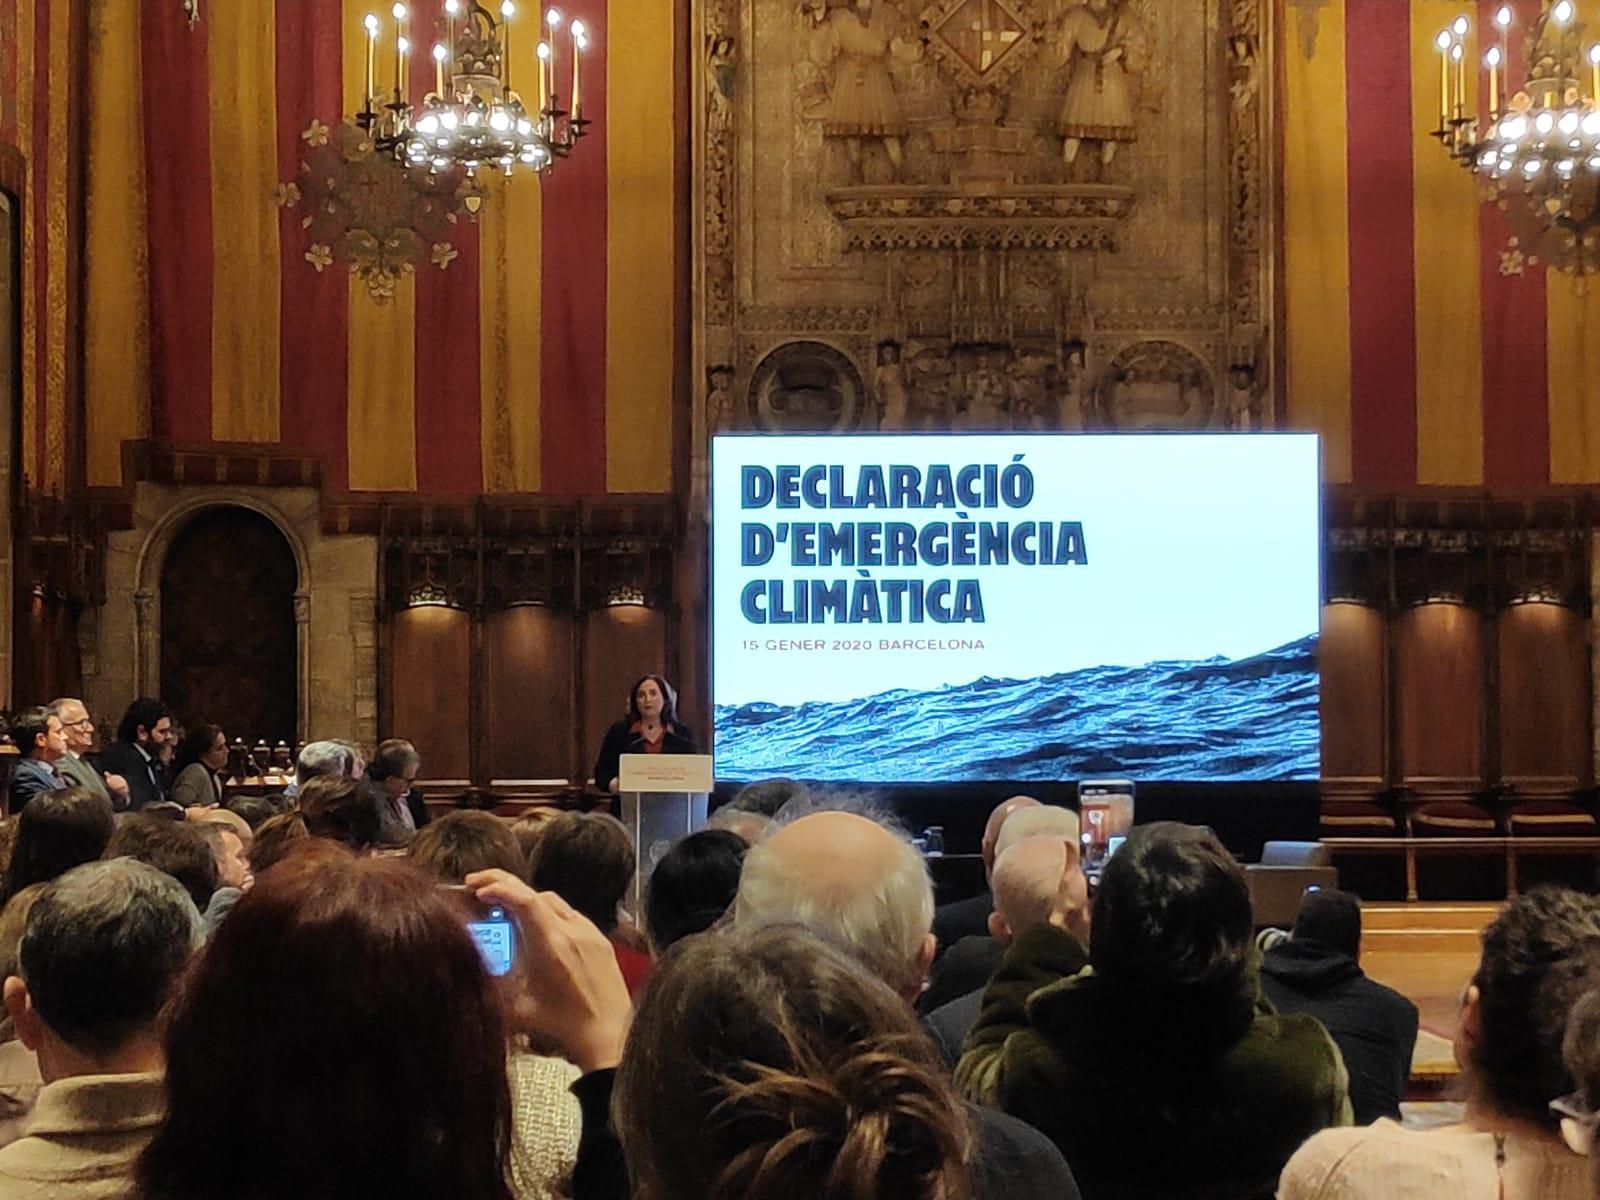 L'alcaldesa de Barcelona, Ada Colau, declarando la emergencia climática